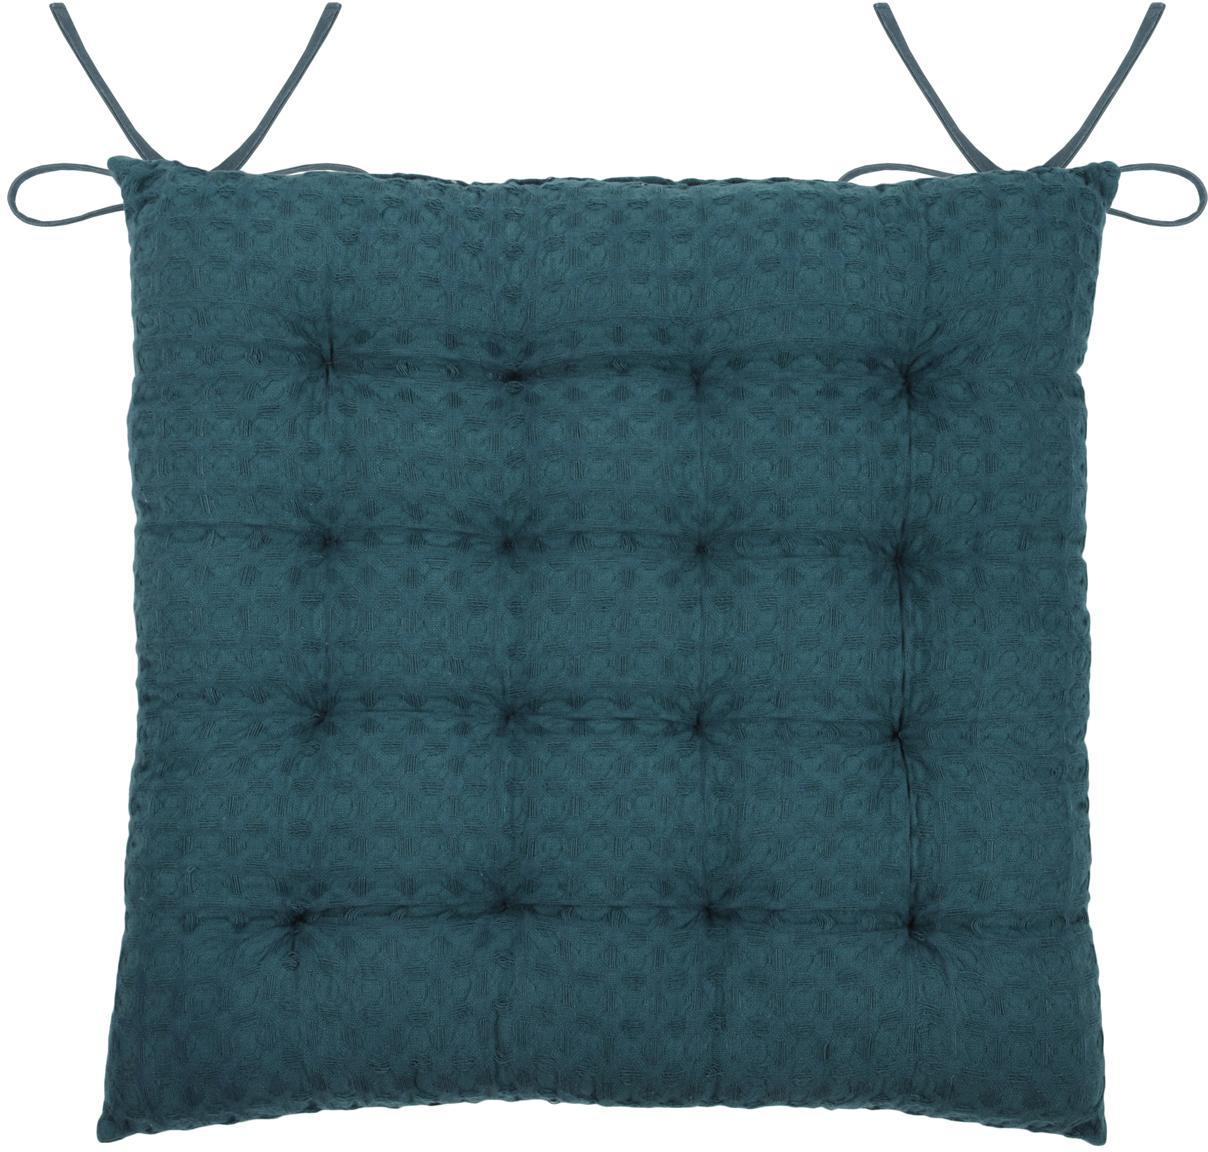 Cuscino sedia Gopher, Blu petrolio, Larg. 40 x Lung. 40 cm